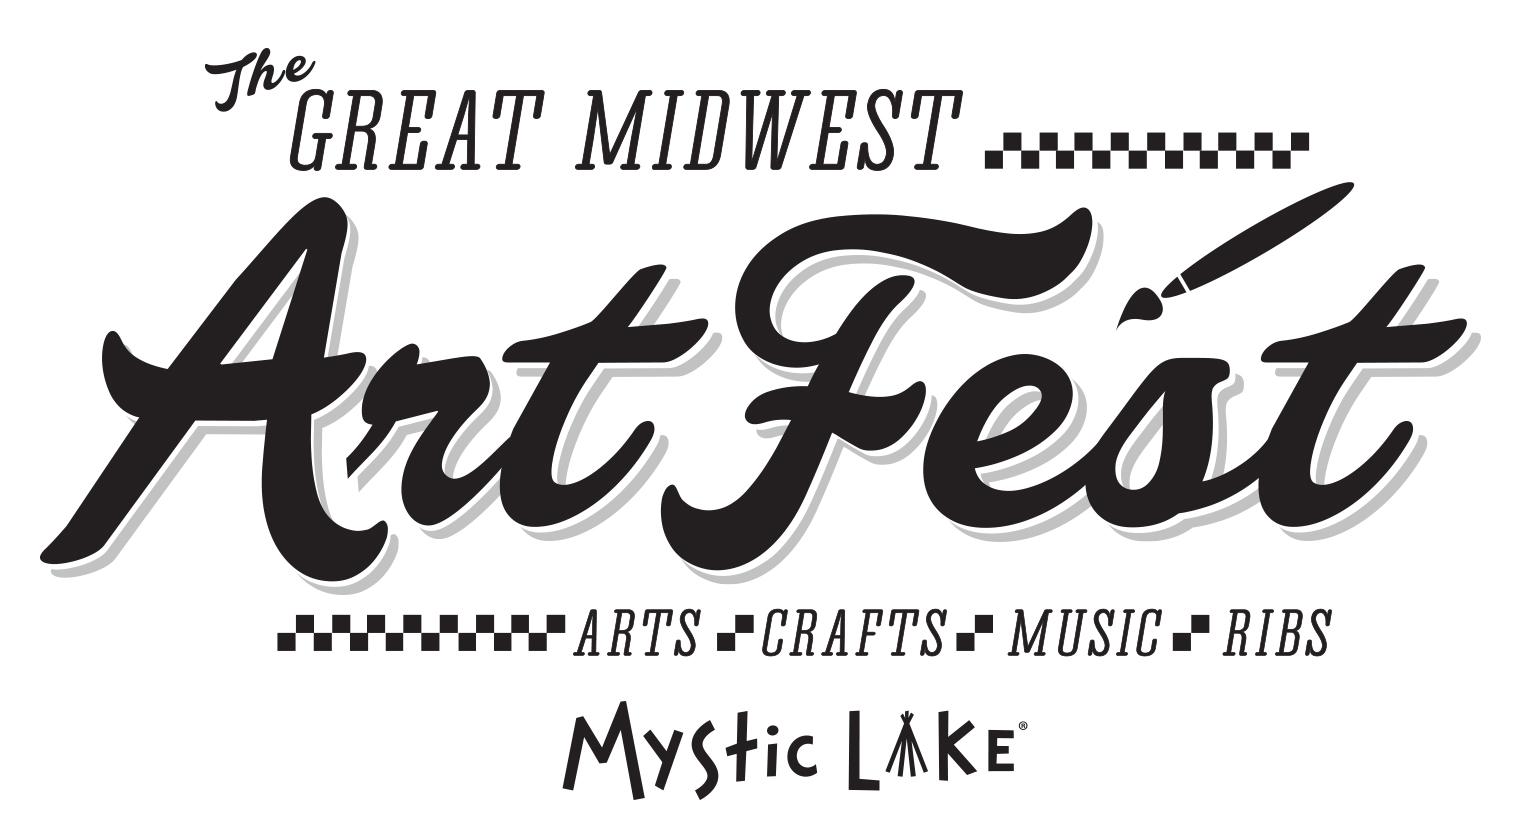 midwest art fest, mystic lake casino arts and crafts fest